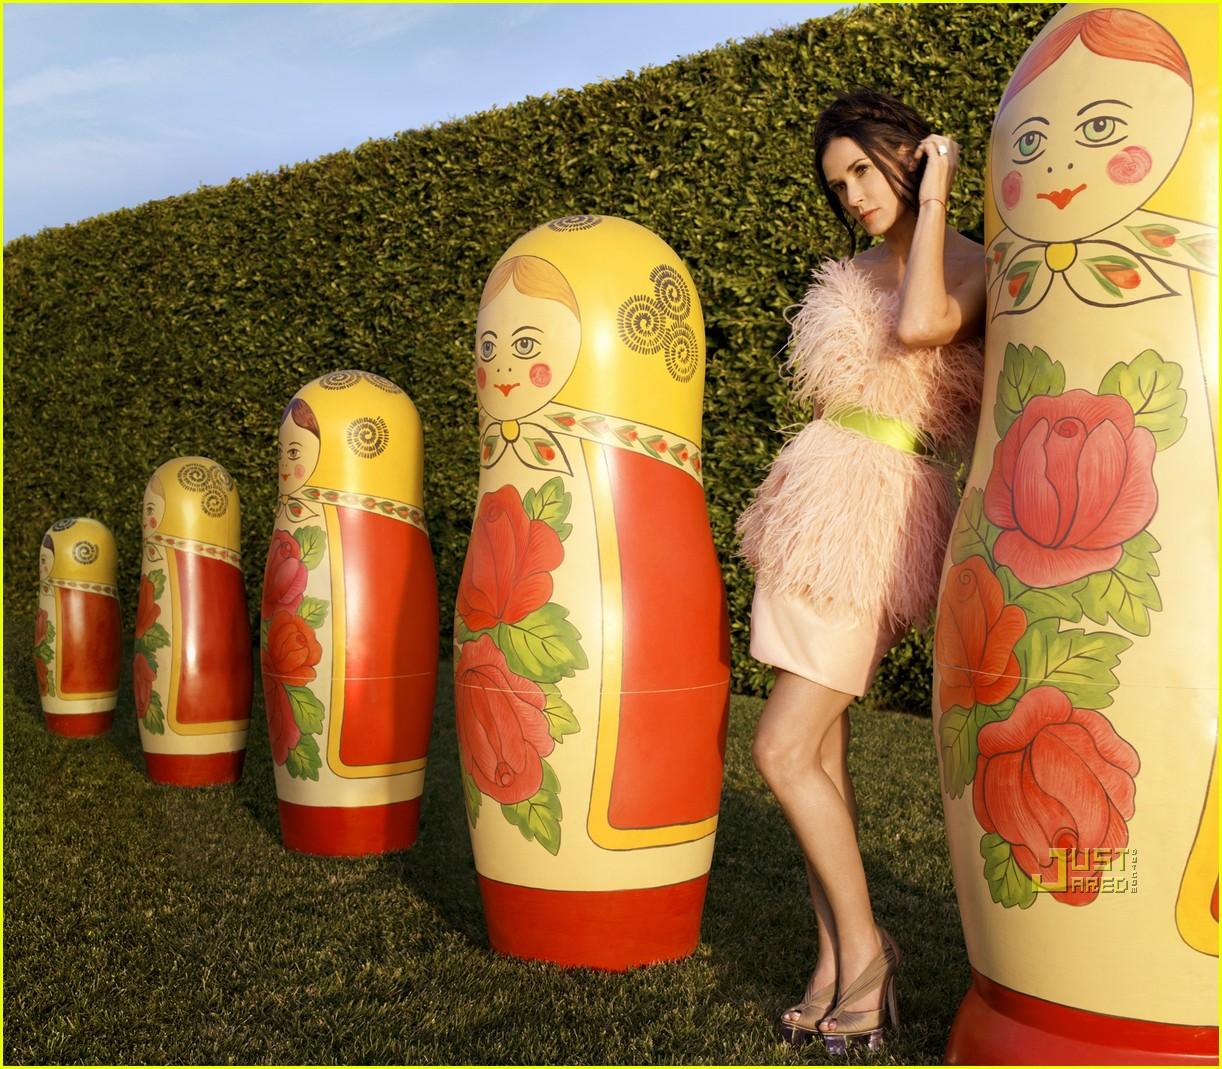 http://3.bp.blogspot.com/_mr3HTWb0vRk/TFkLMwQYEbI/AAAAAAAADnE/uLAs2AMz3-8/s1600/demi-moore-harpers-bazaar-april-2010-cover-02.jpg